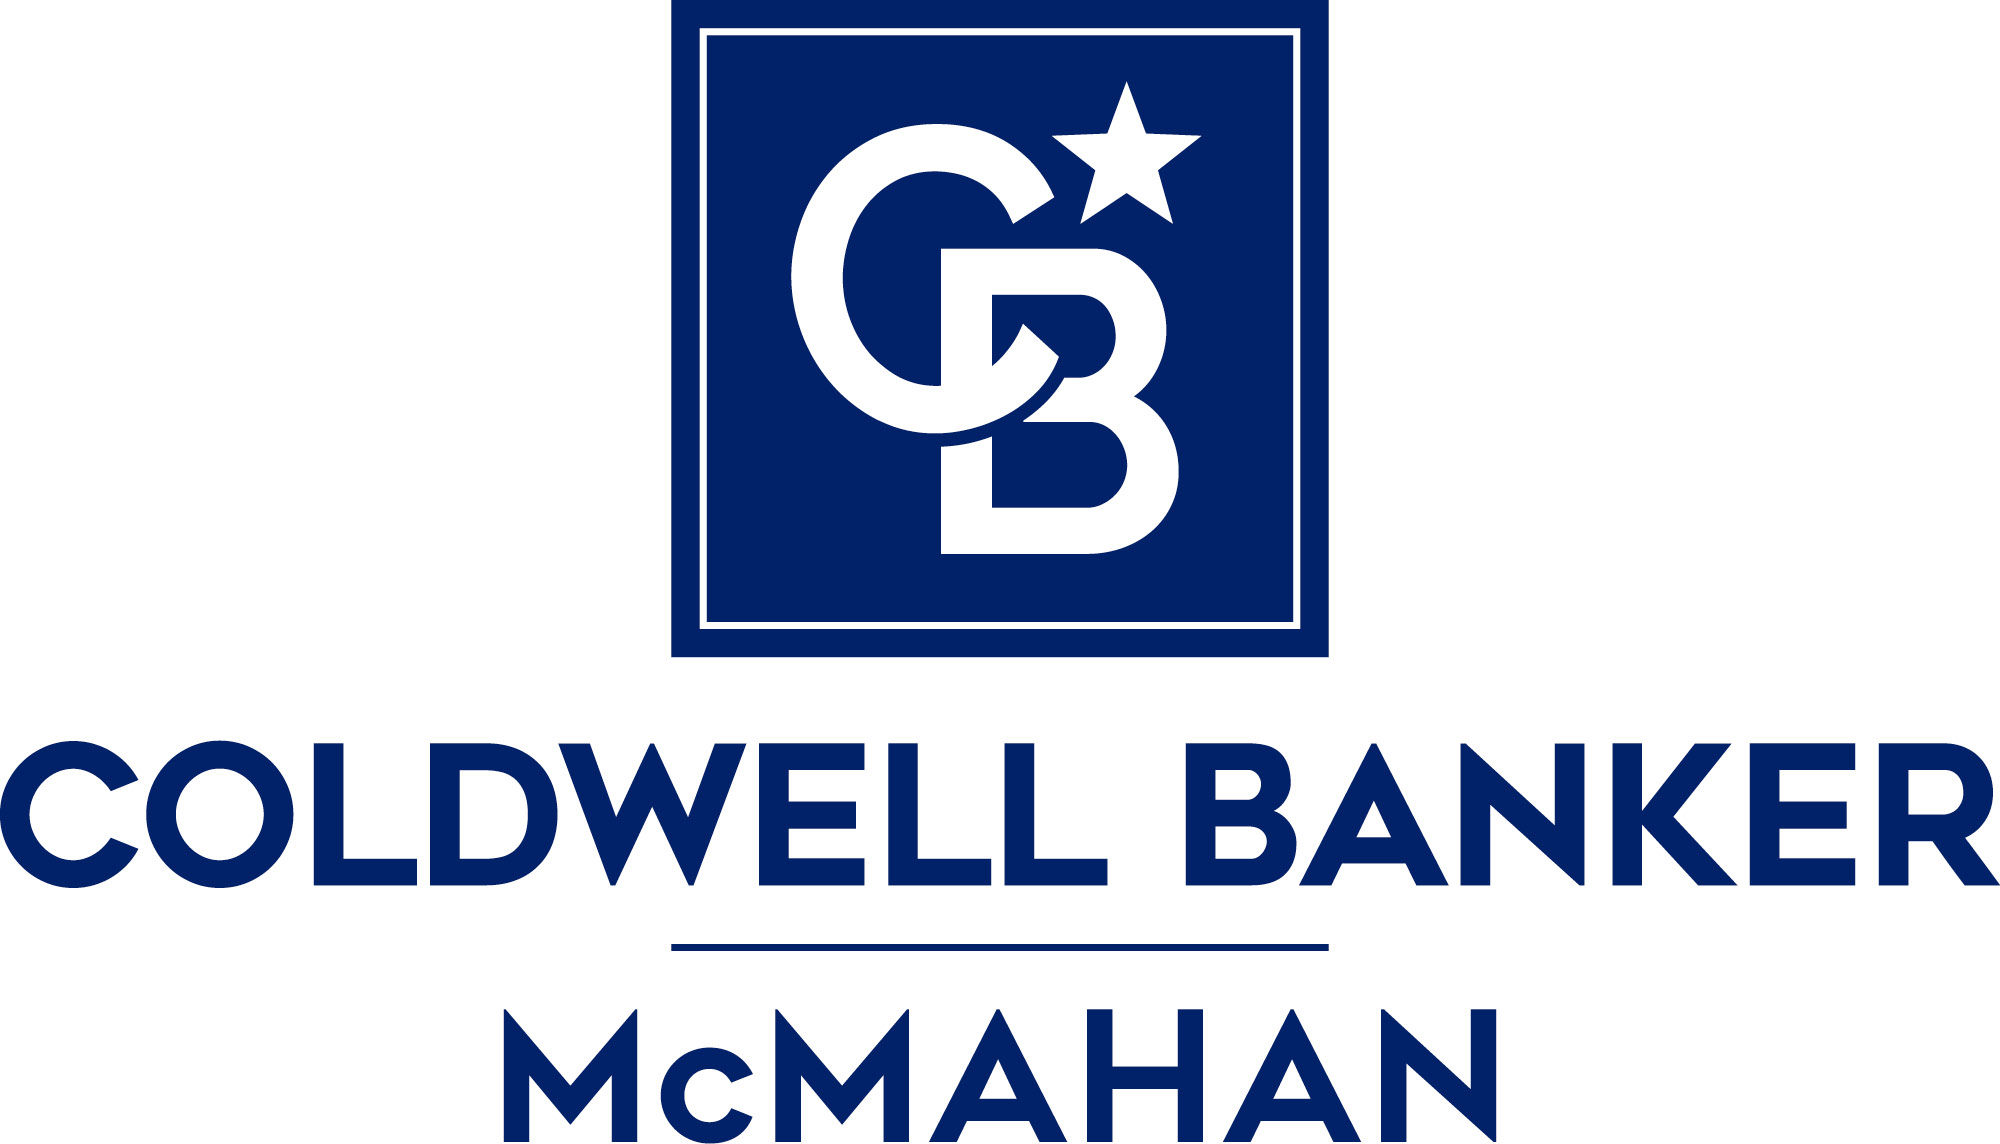 KIERA HAUGEN - Coldwell Banker McMahan Logo